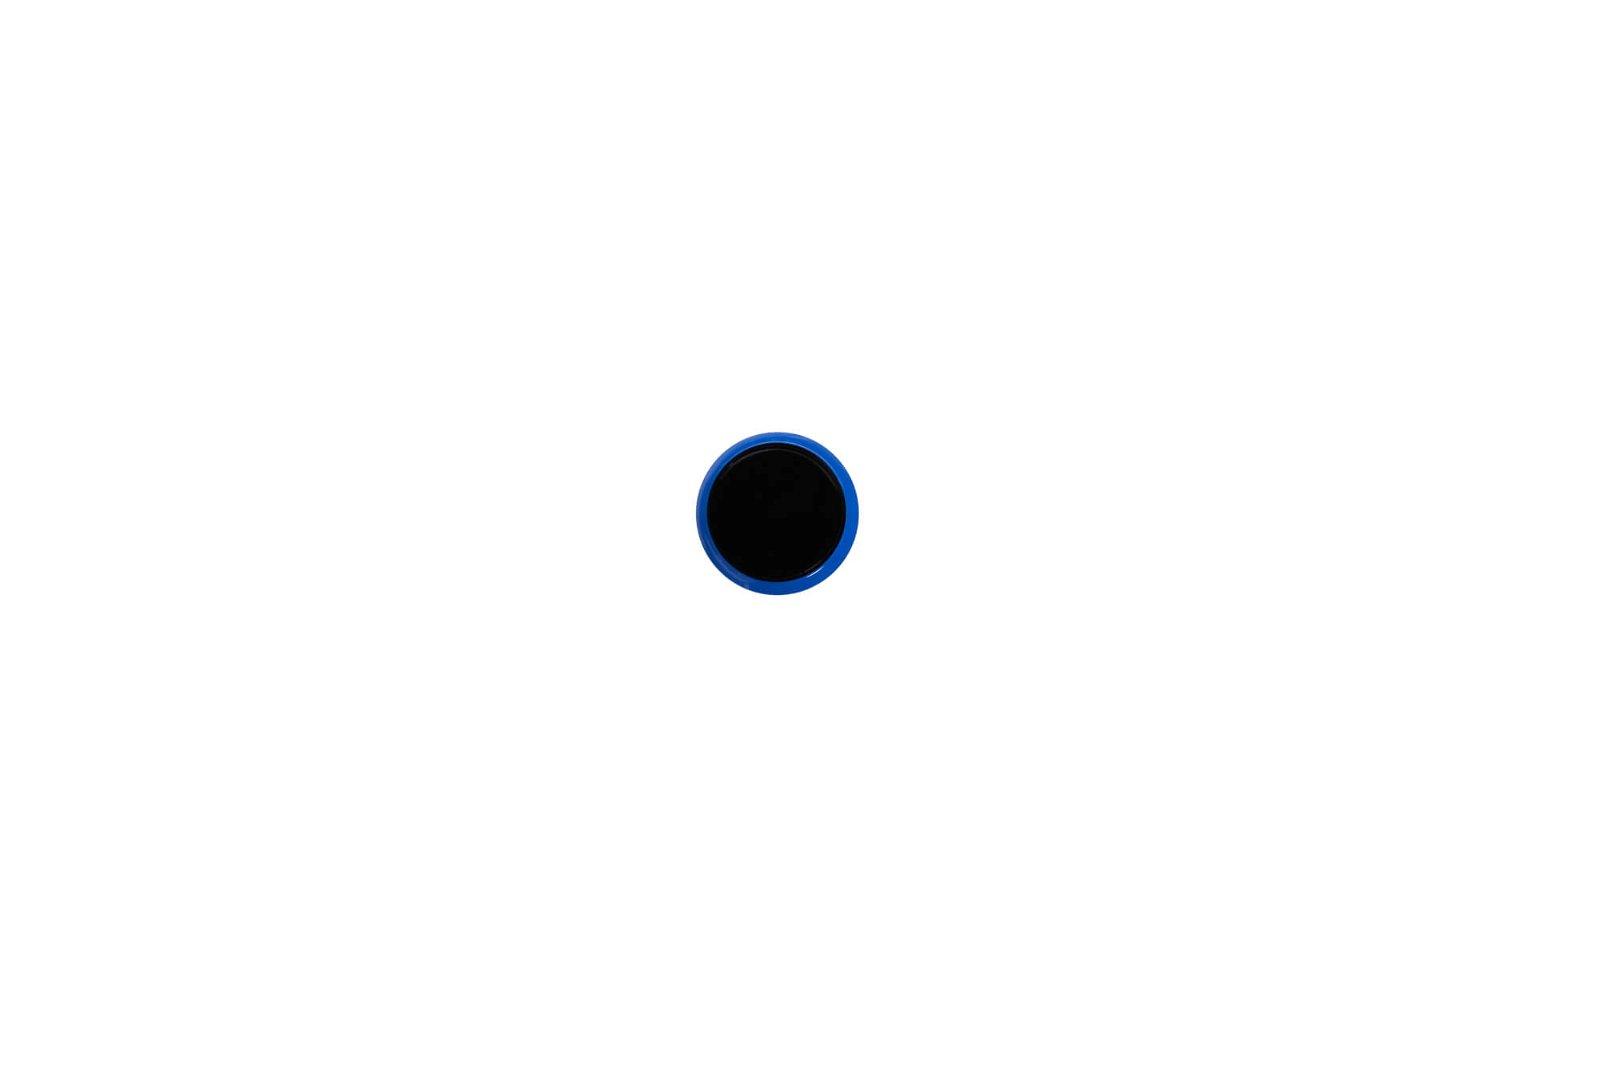 Kugel-Magnet Ø 30 mm, 0,6 kg Haftkraft, 10 St./Set, blau